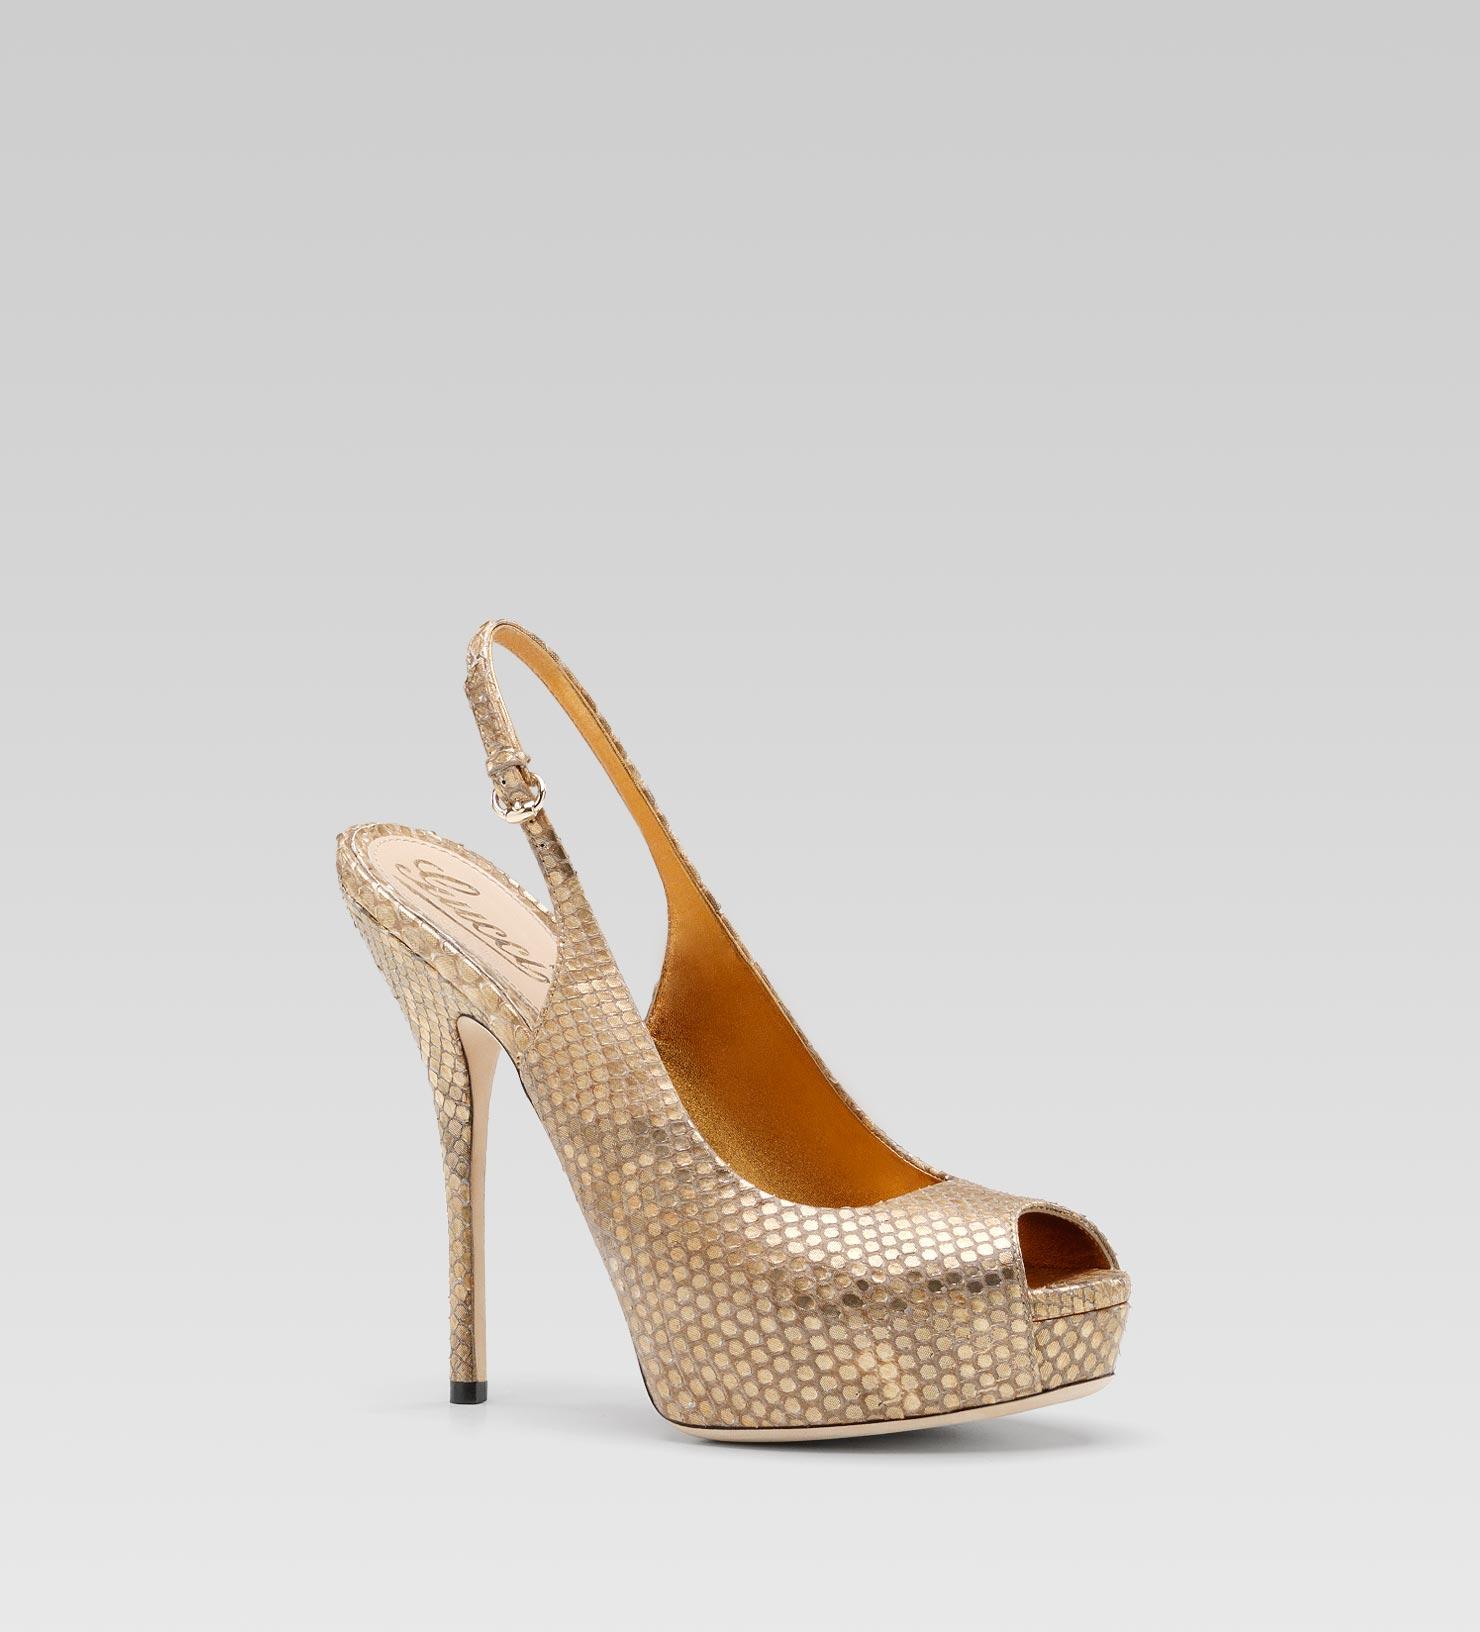 4184af10b Gucci Sofia High Heel Slingback Platform Sandal in Metallic - Lyst